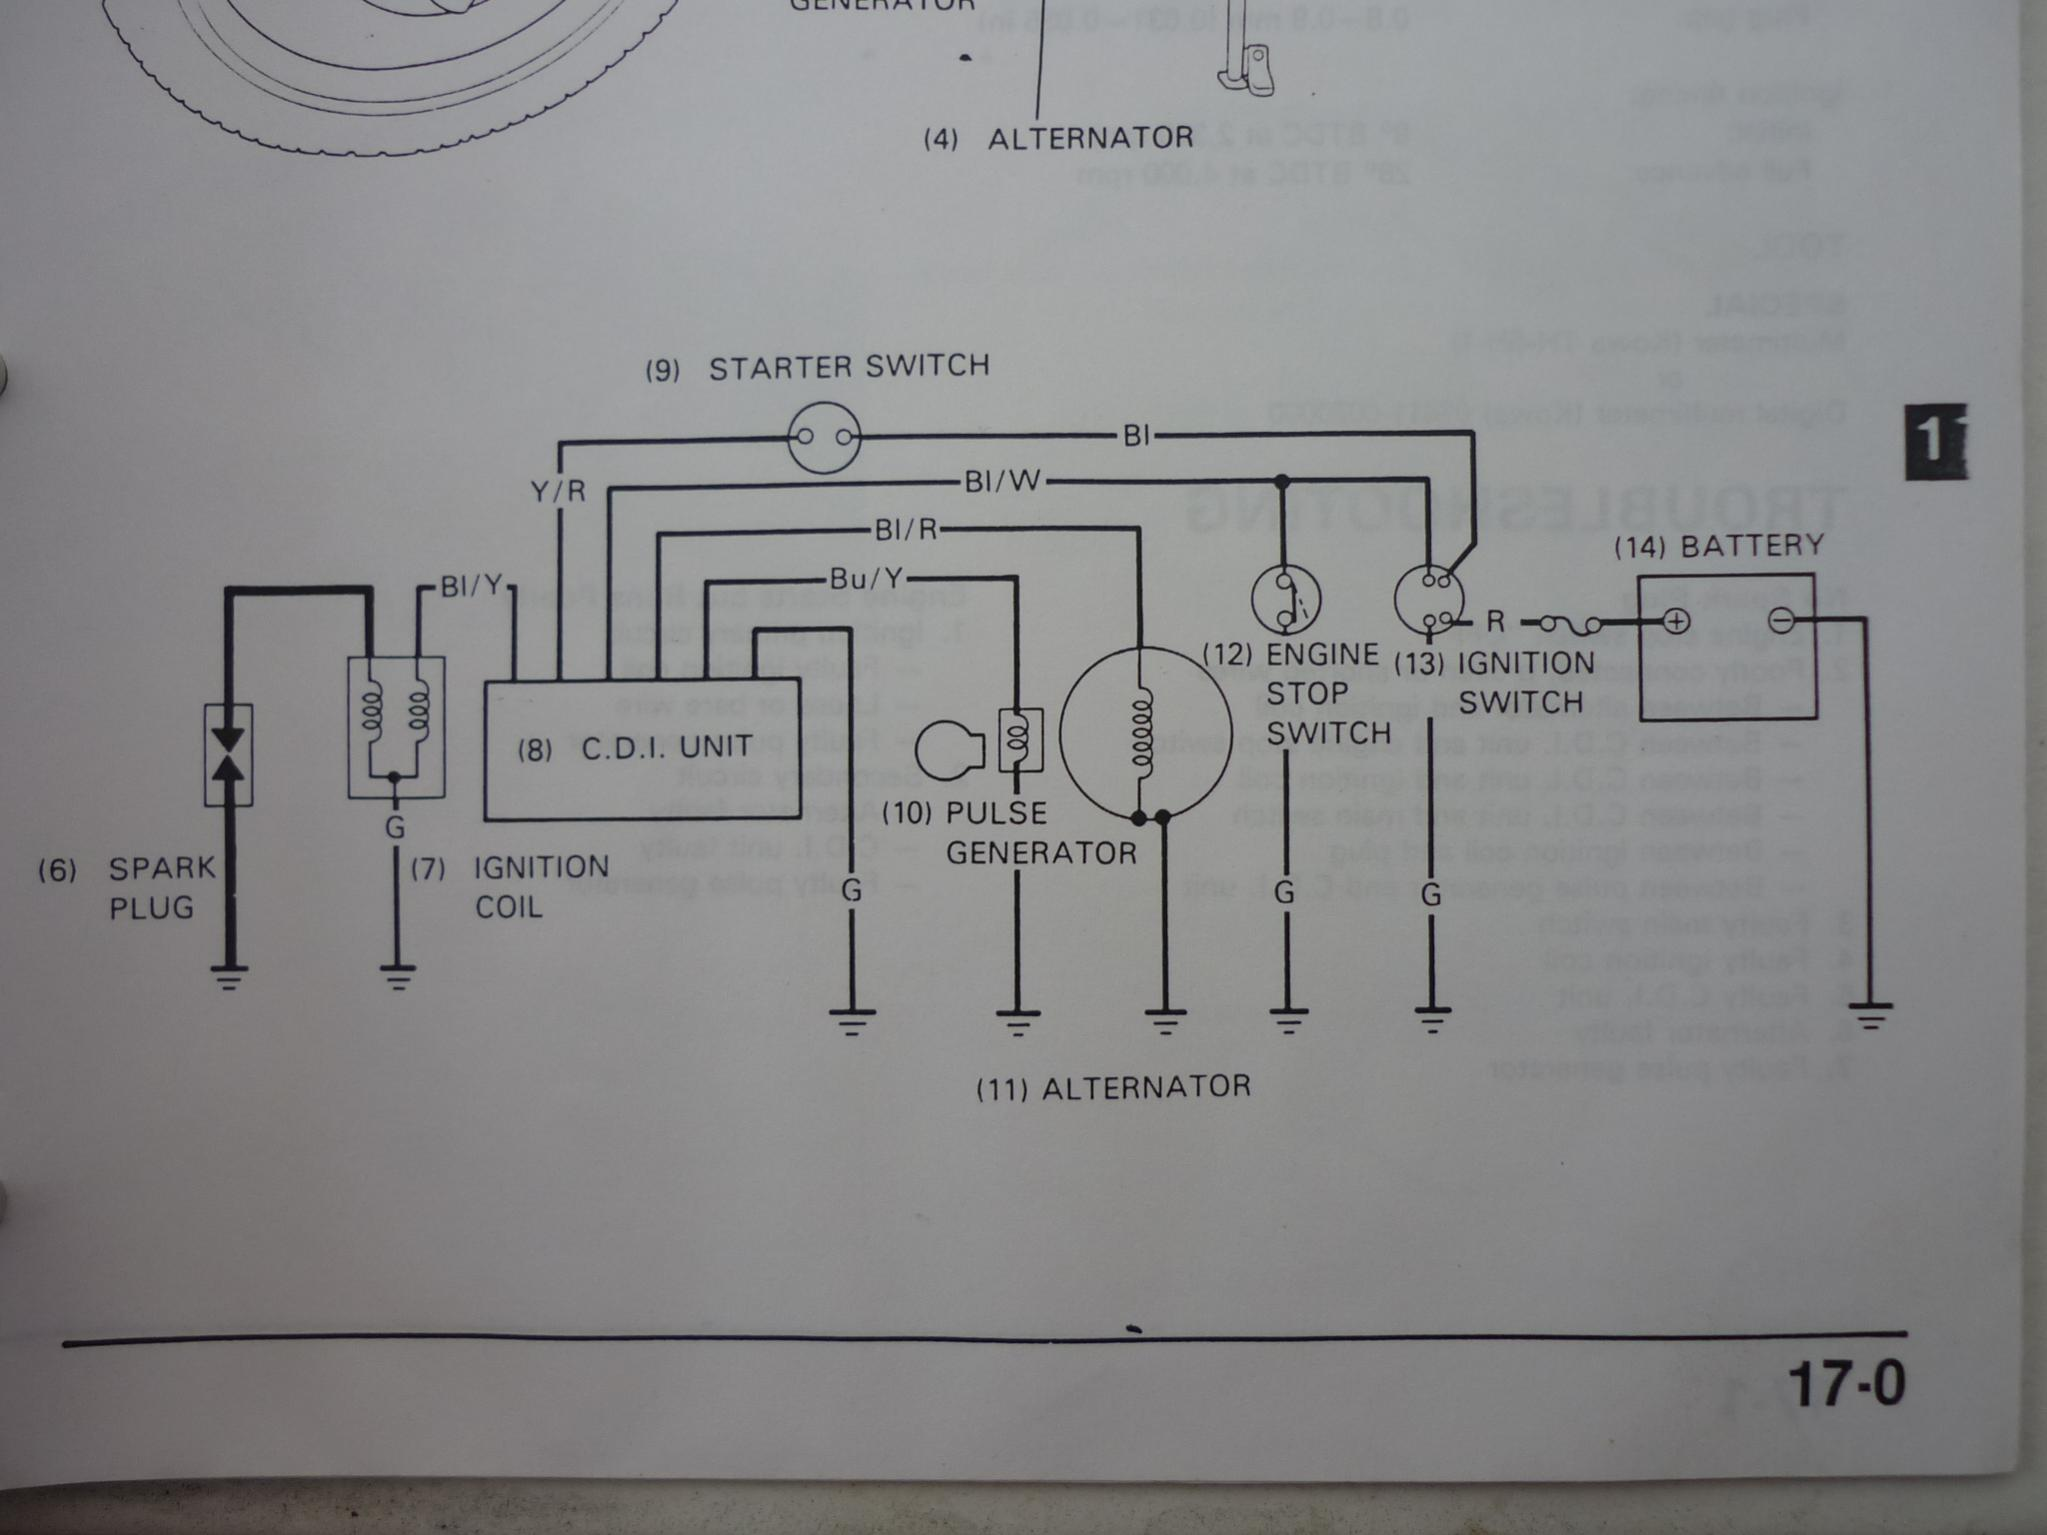 Free Motorcycle Wiring Diagrams 85 Xr 600. Free. Free ... on xr600r wiring diagram, vt1100c2 wiring diagram, xr250r wiring diagram, xr250l wiring diagram, xr650r wiring diagram, dr650 wiring diagram, crf450r wiring diagram, trx 300ex wiring diagram, ct70 wiring diagram, xr80 wiring diagram, cbr929rr wiring diagram, klr650 wiring diagram, xr350r wiring diagram, rebel wiring diagram, crf250x wiring diagram, honda wiring diagram, crf230l wiring diagram, crf250r wiring diagram, key switch wiring diagram, cx500 wiring diagram,